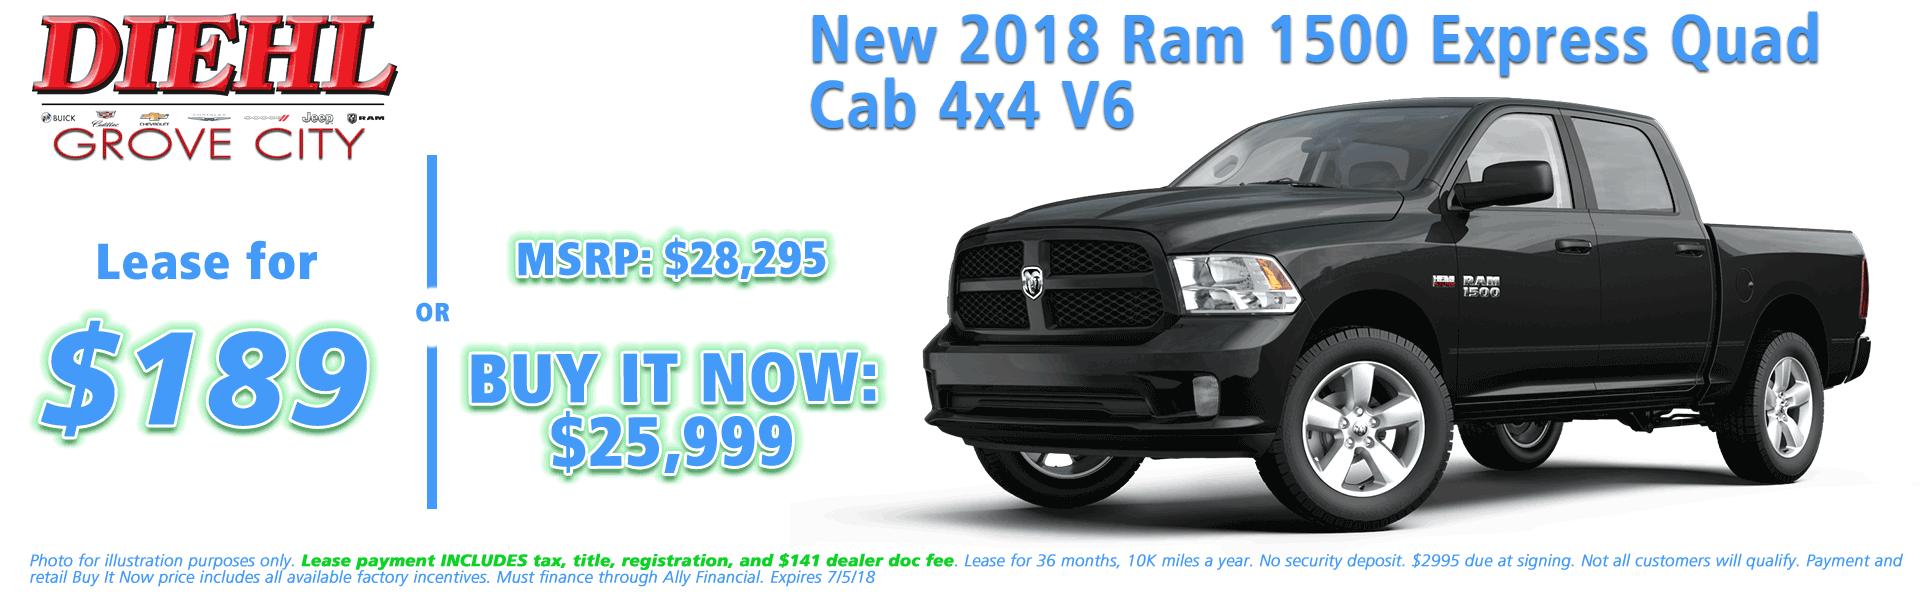 NEW 2018 RAM 1500 EXPRESS QUAD CAB 4X4 6'4